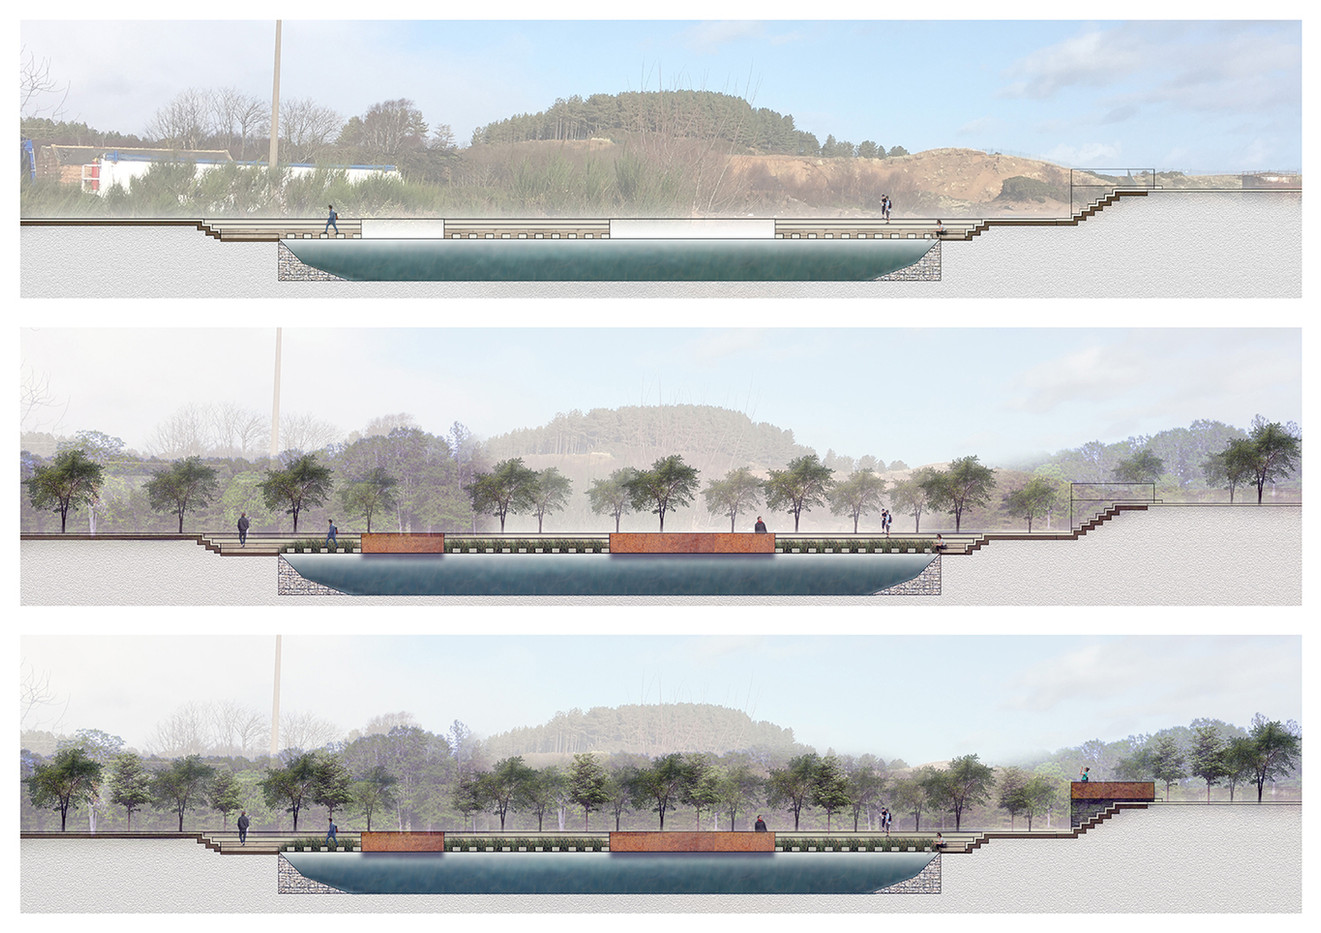 Garnock Valley: Retention Basin Visualisation, Pencil Sketch and Photoshop, 2020.